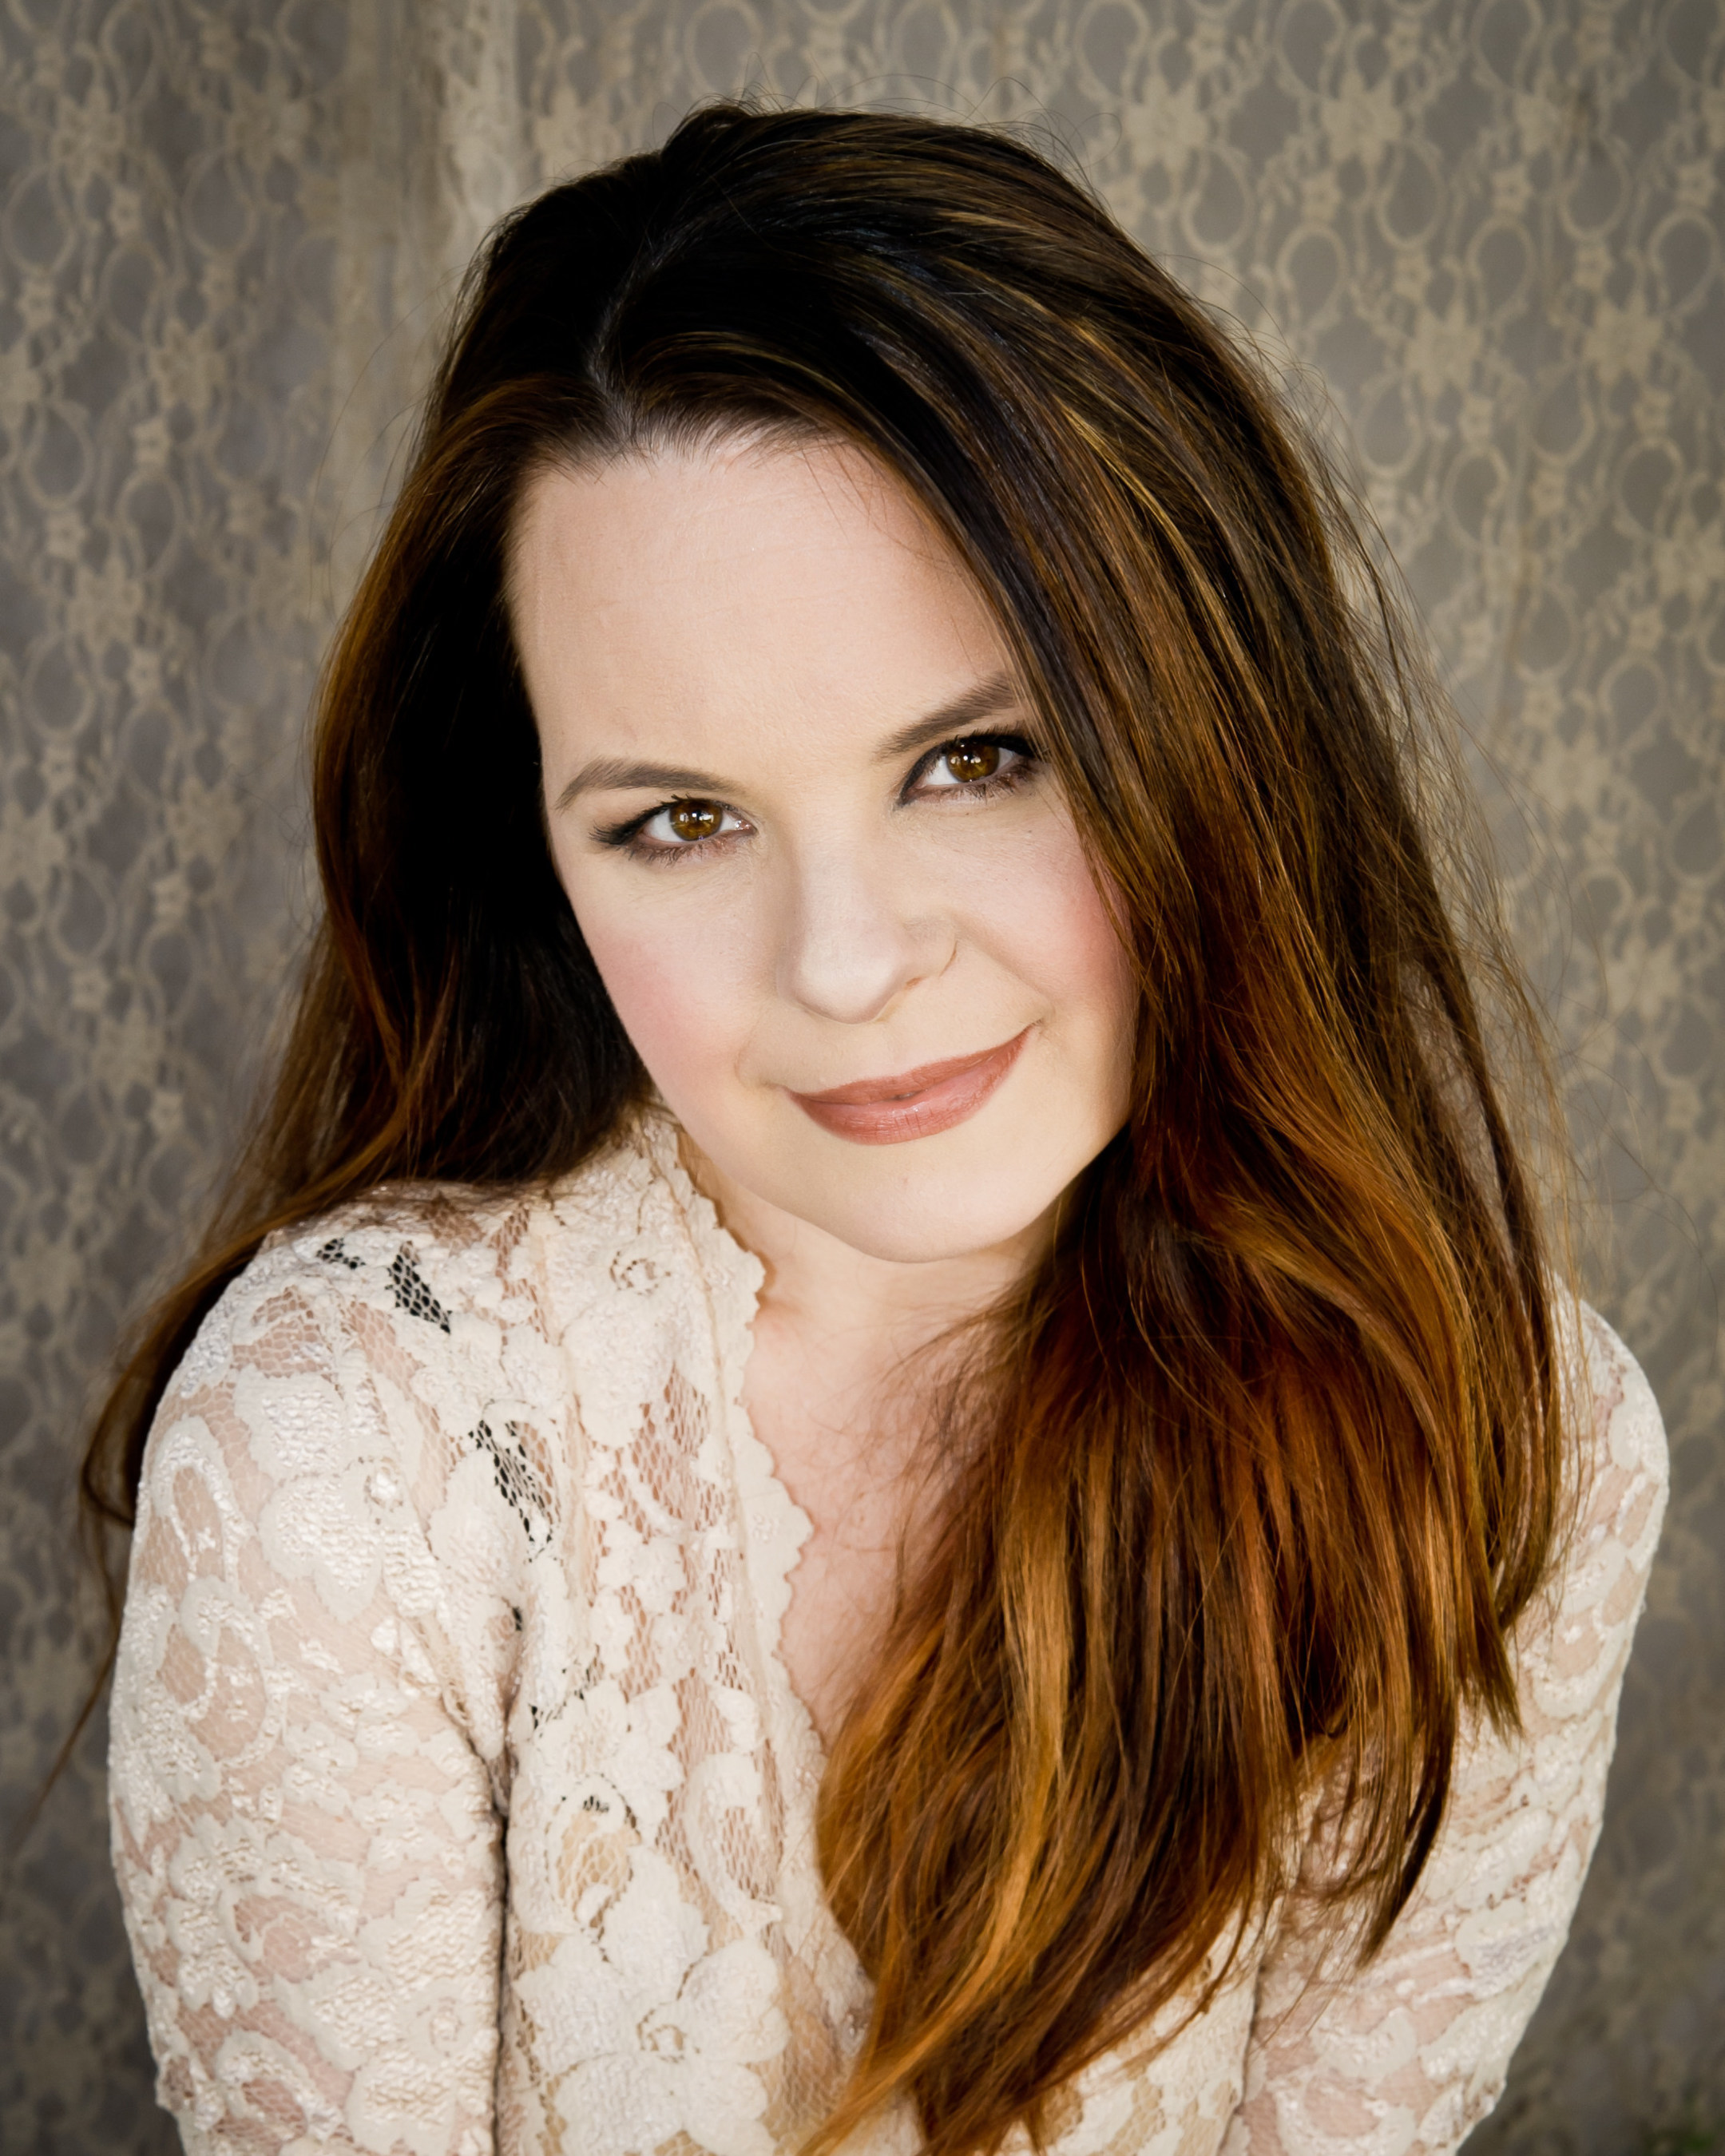 Actress Jenna von Oy